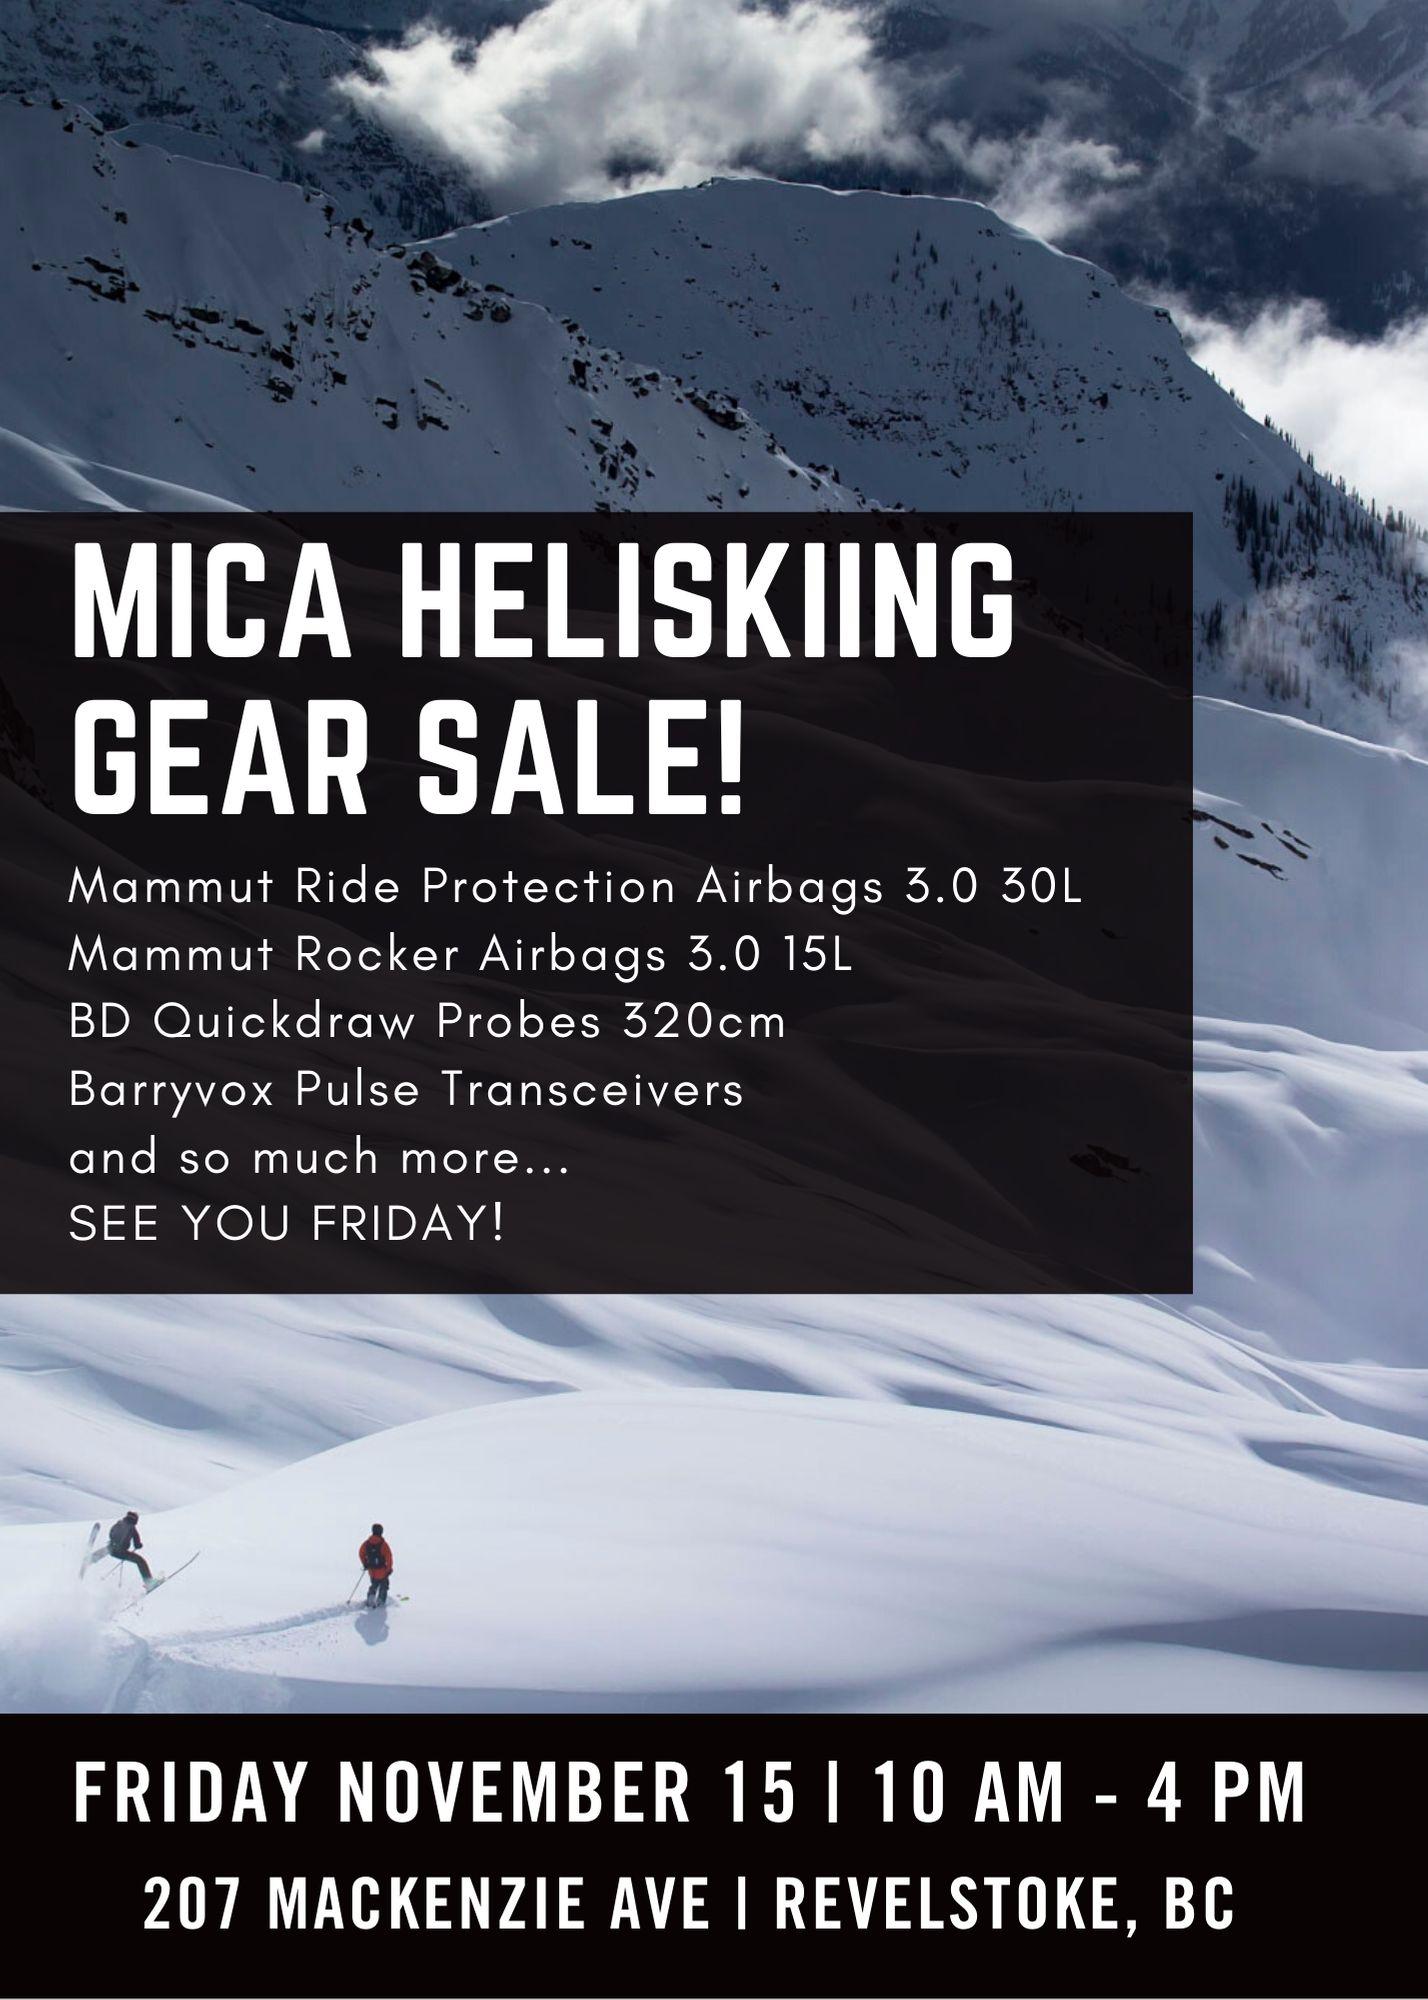 Mica Heliskiing Gear Sale @ Mica Heliskiing